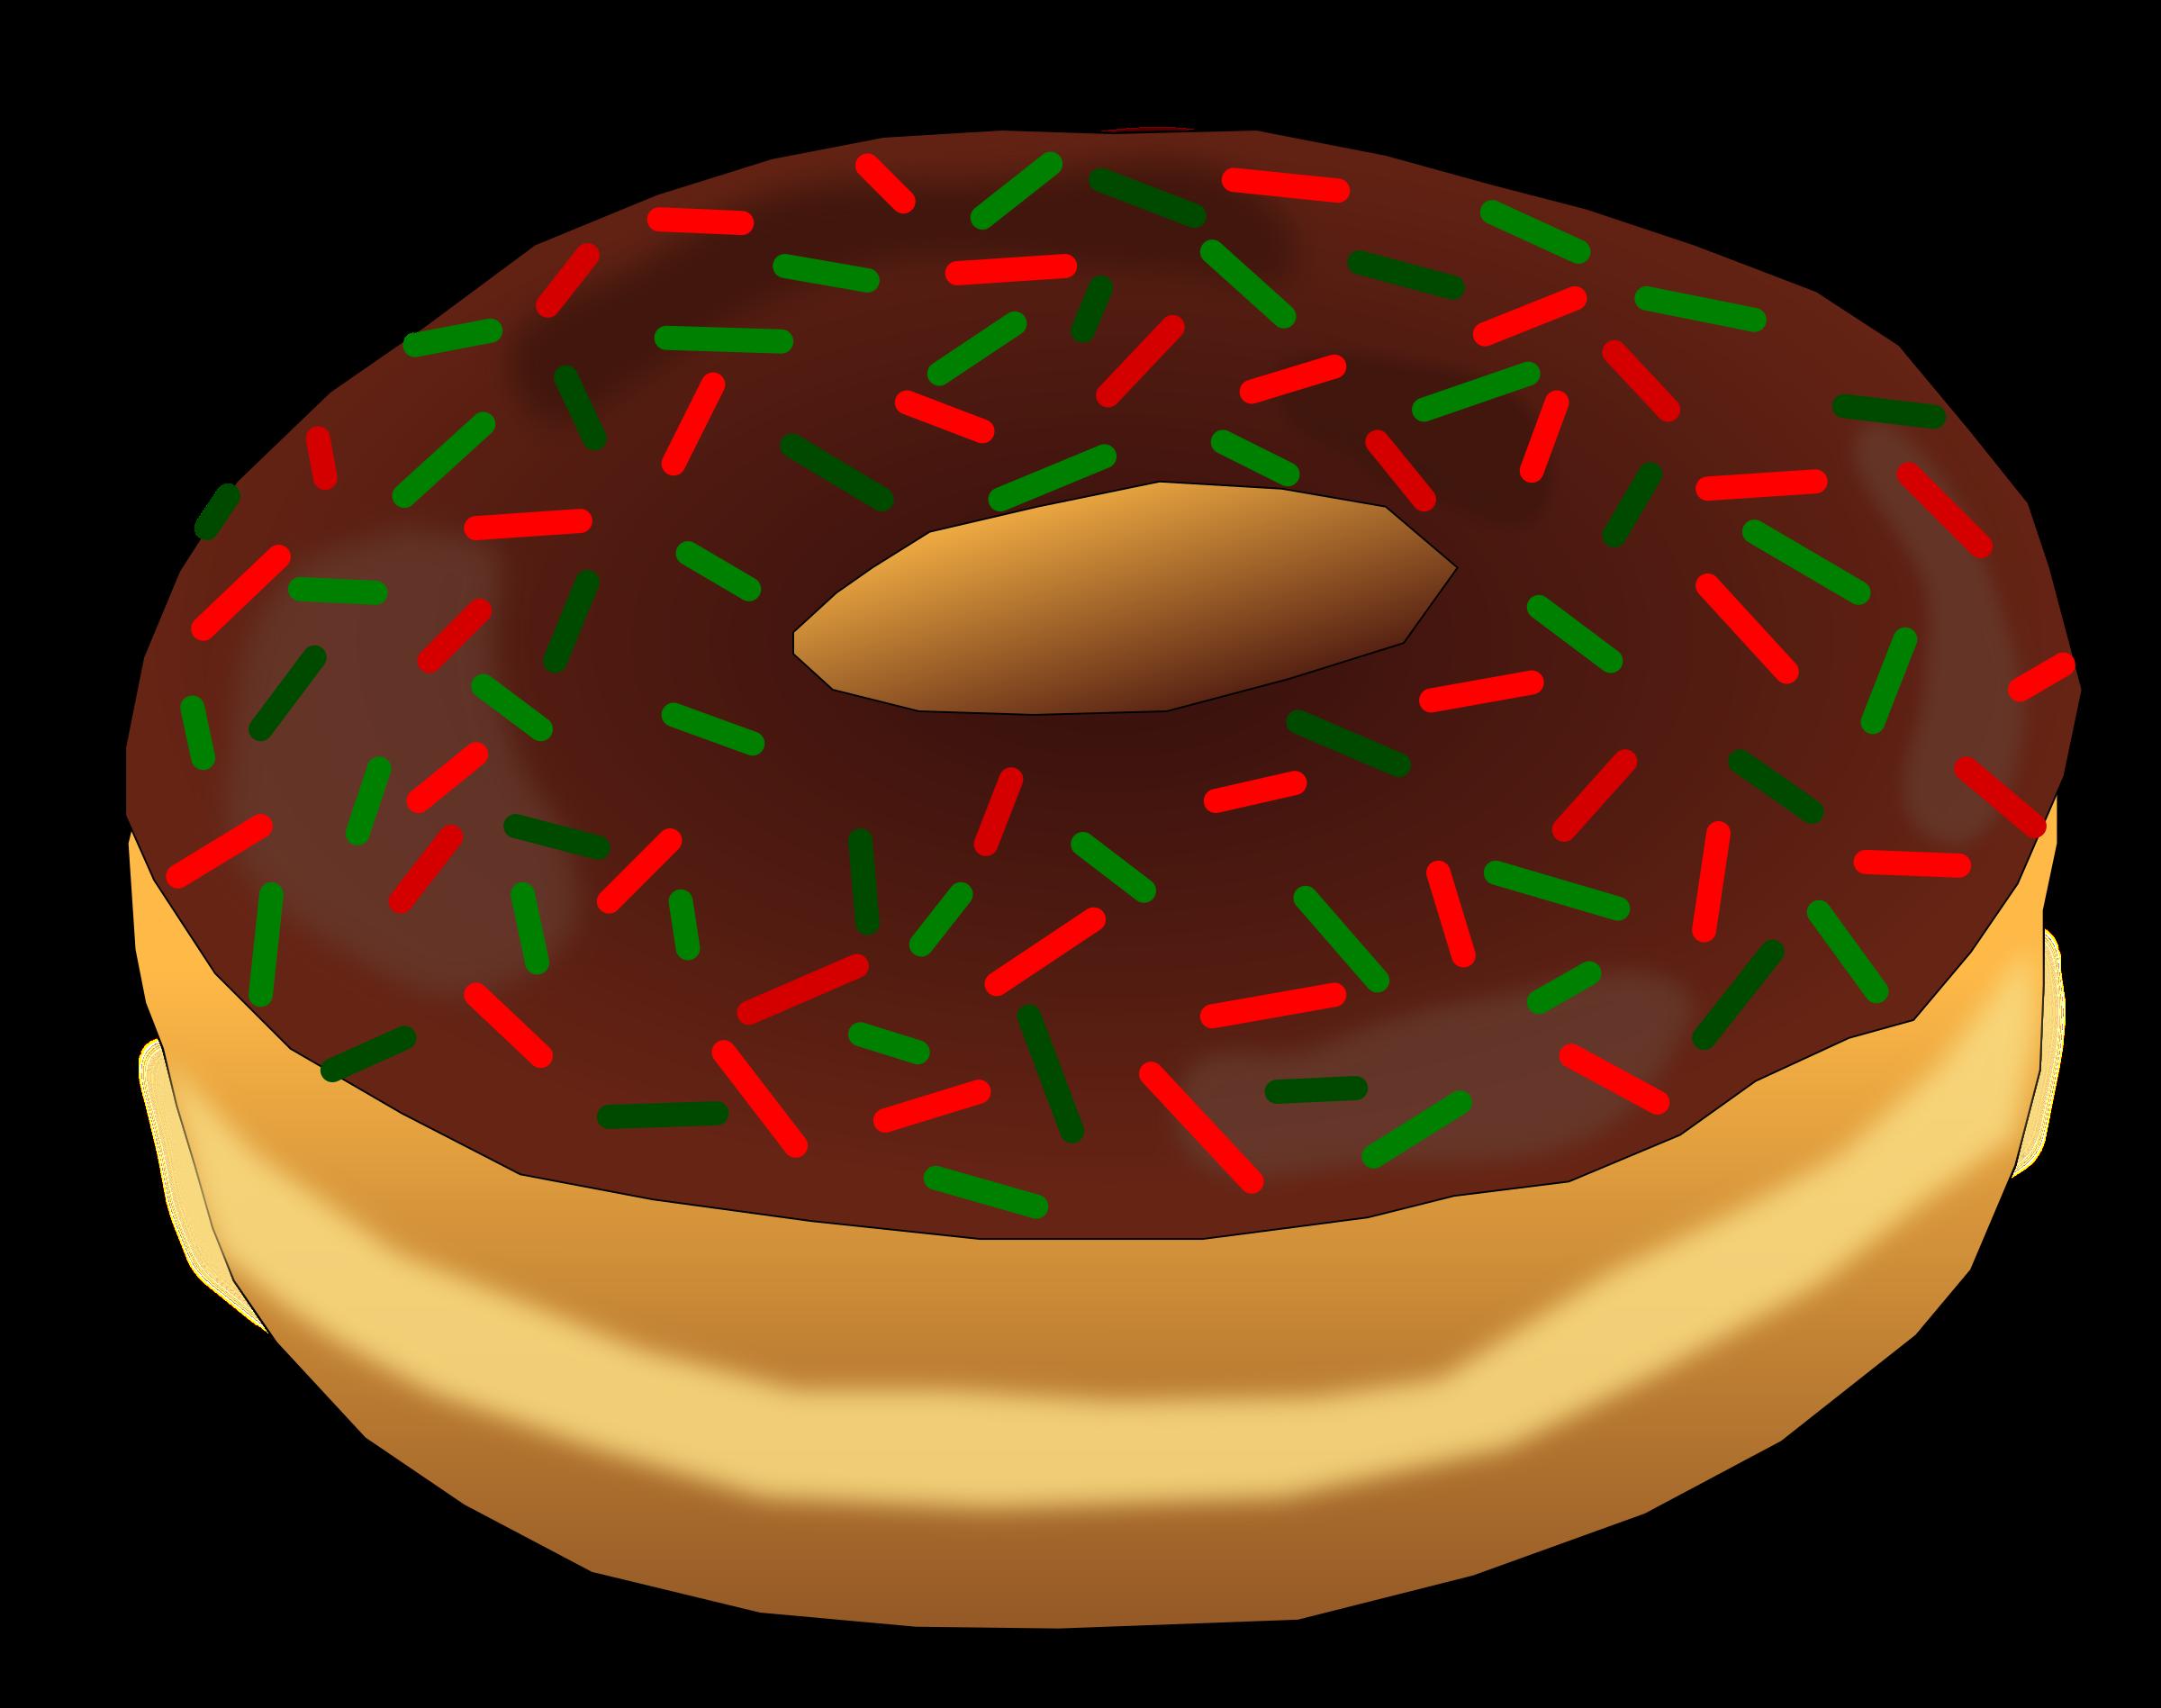 Donut clipart border. Christmas big image png